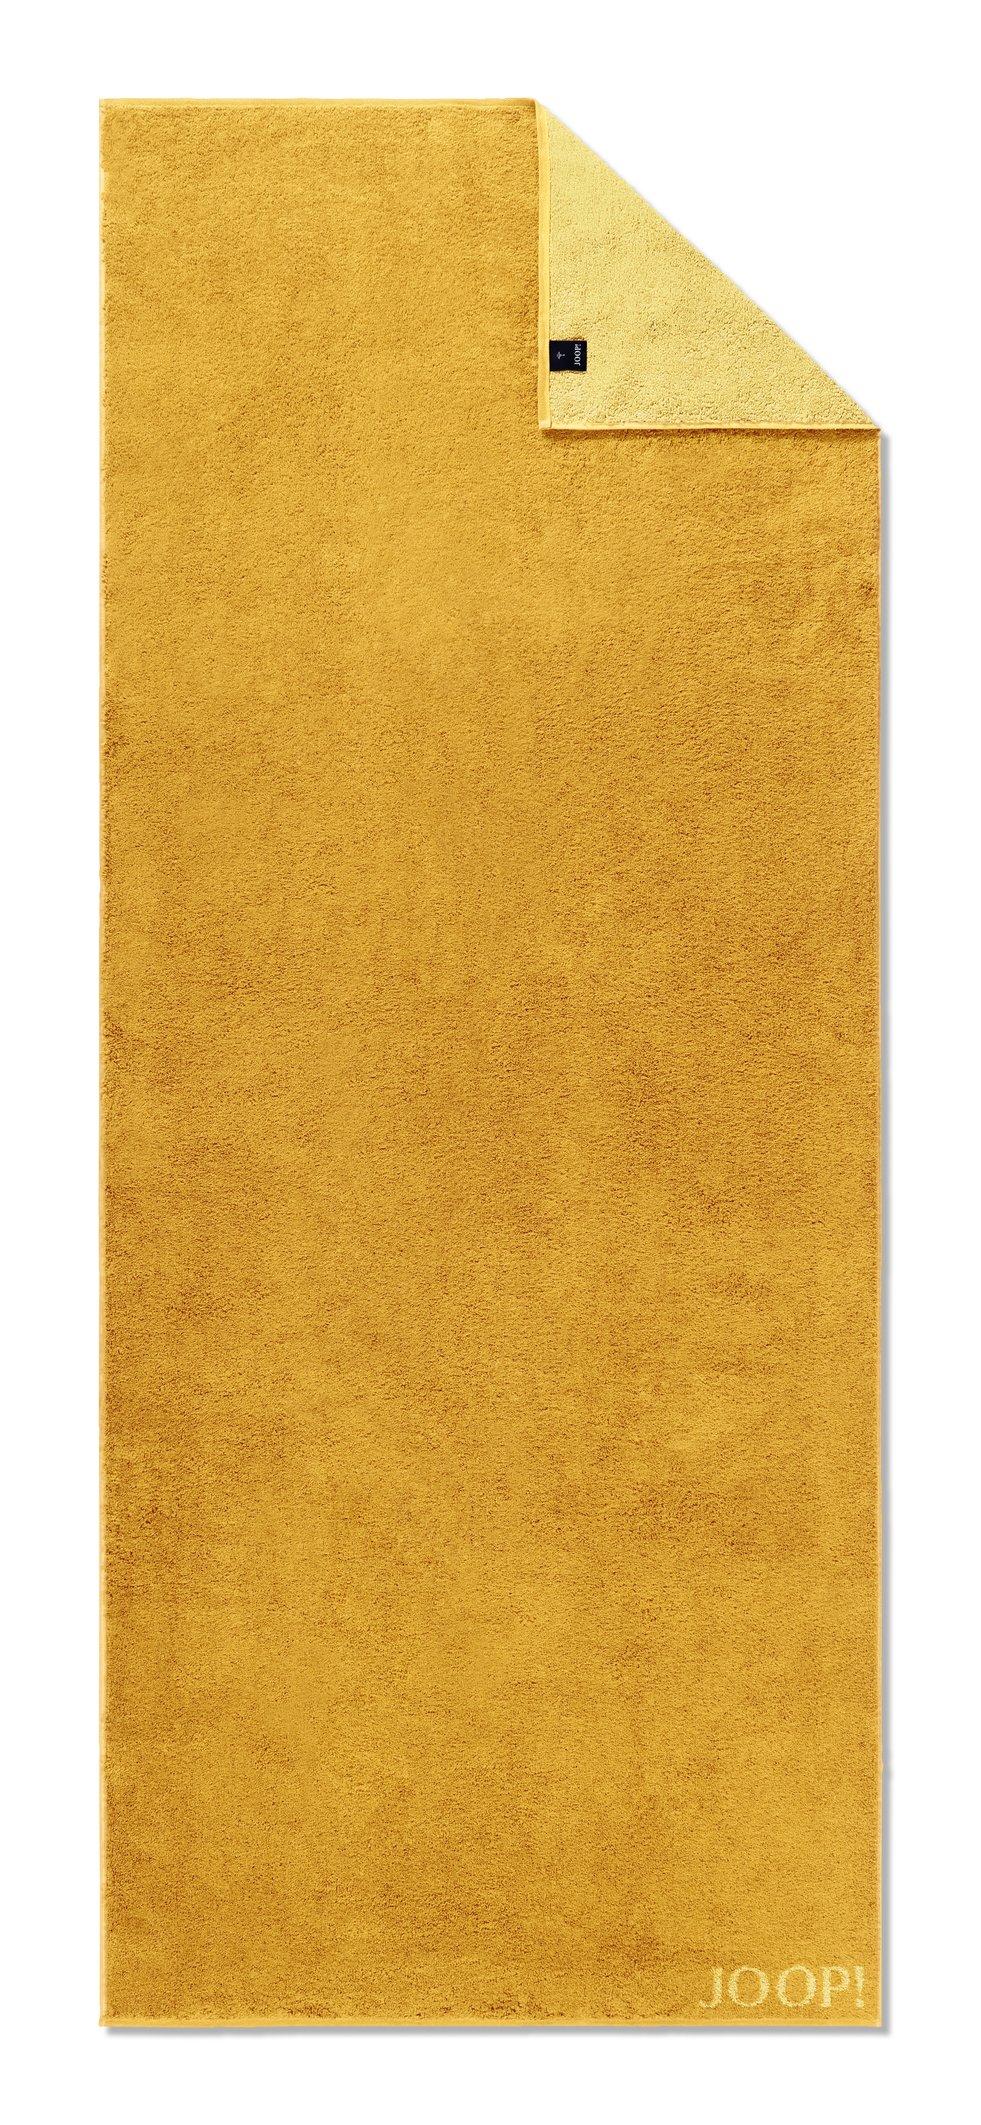 JOOP! Classic Doubleface Saunatuch 80x200 cm 1600-50 Honig